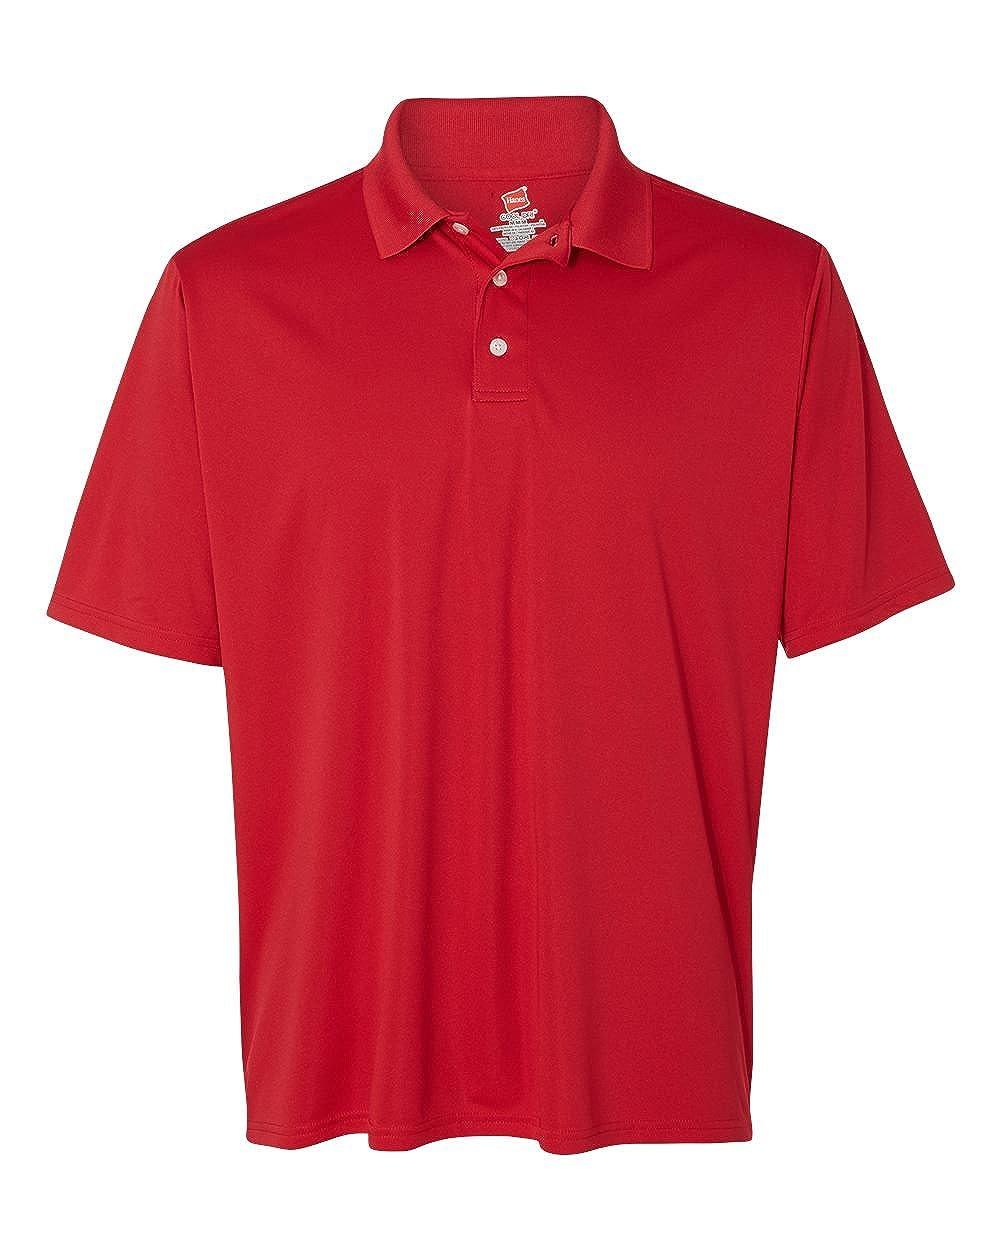 Hanes Mens Comfortable Performance Polo Shirt